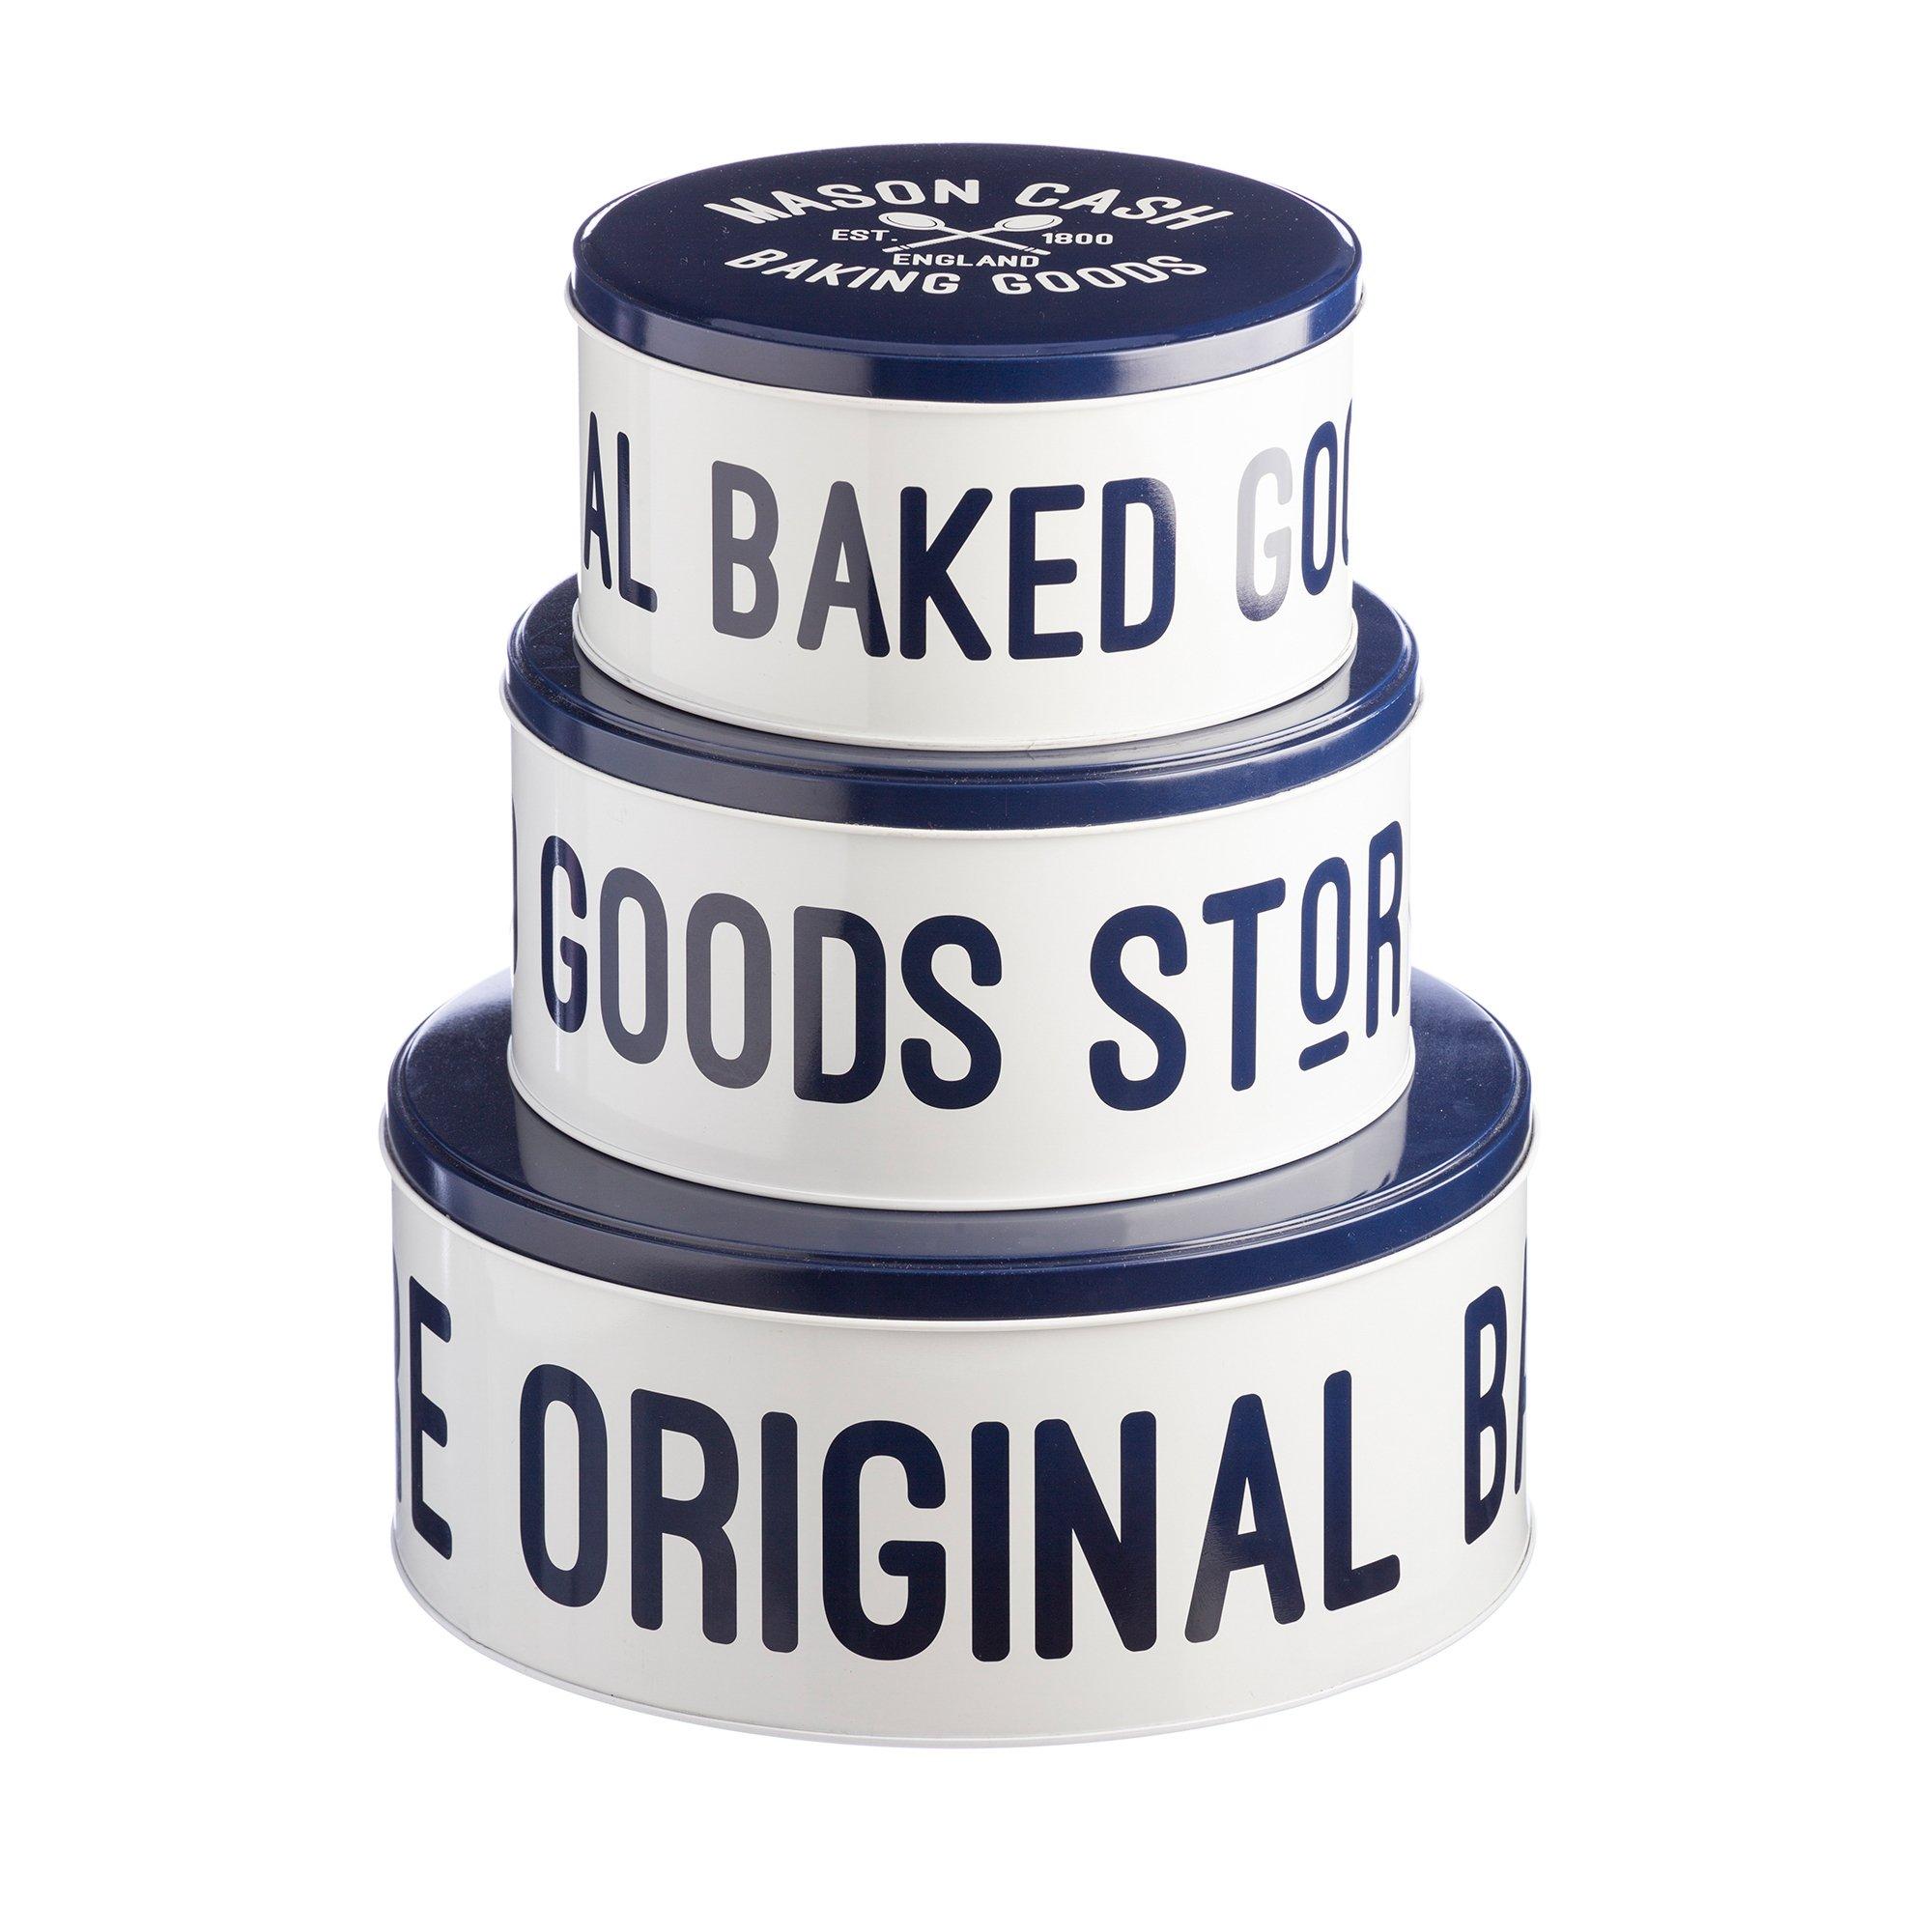 Mason Cash Varsity Cake Tins, Set of 3, Cream, Navy Blue